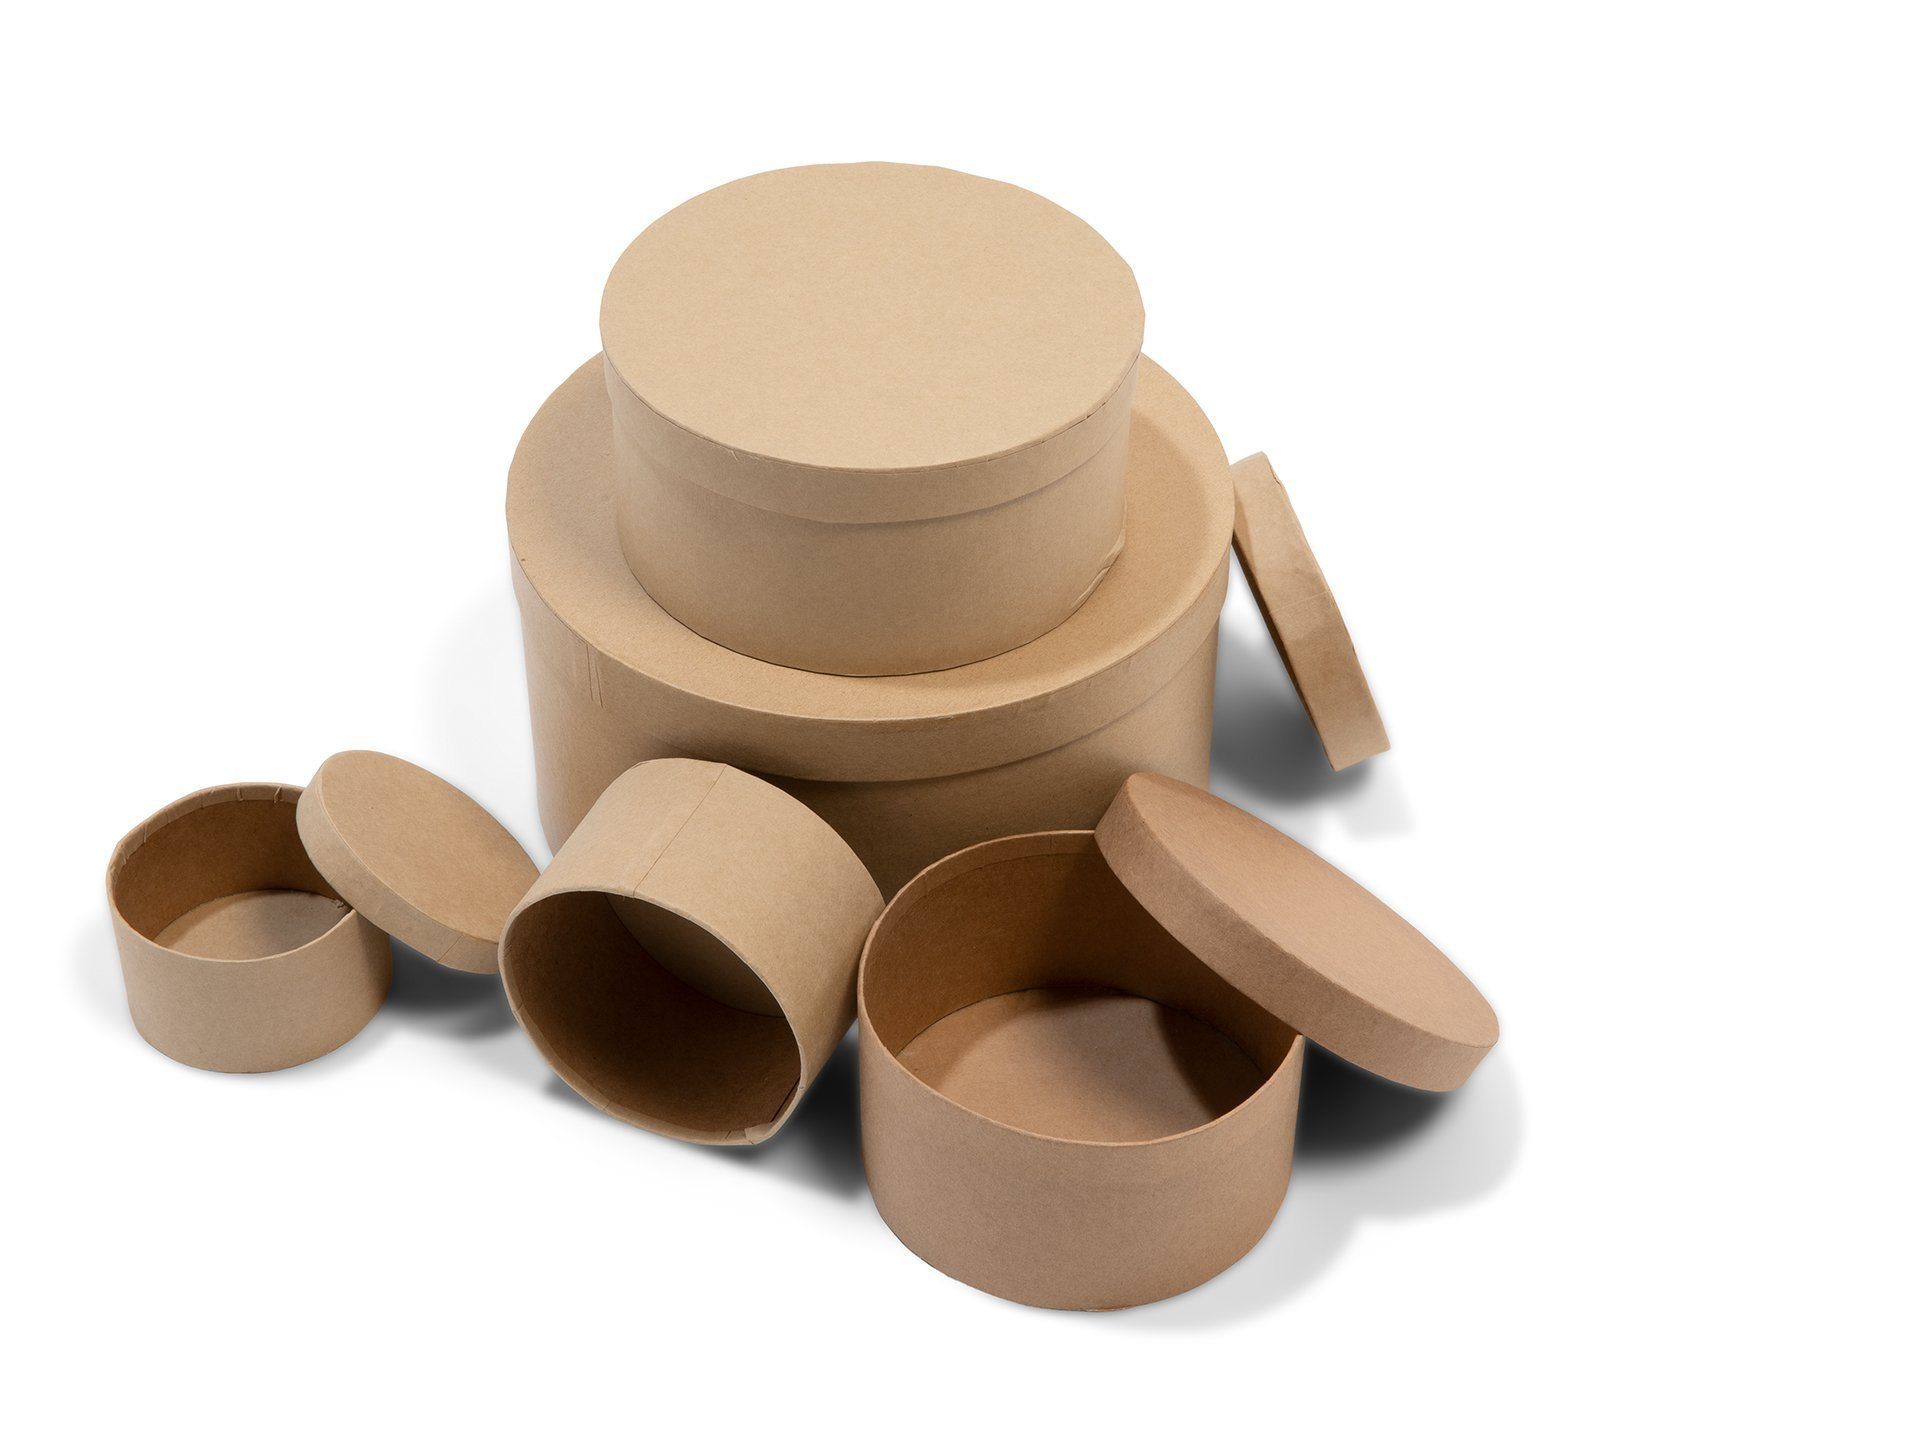 Buy Round cardboard box, untreated, brown online at Modulor